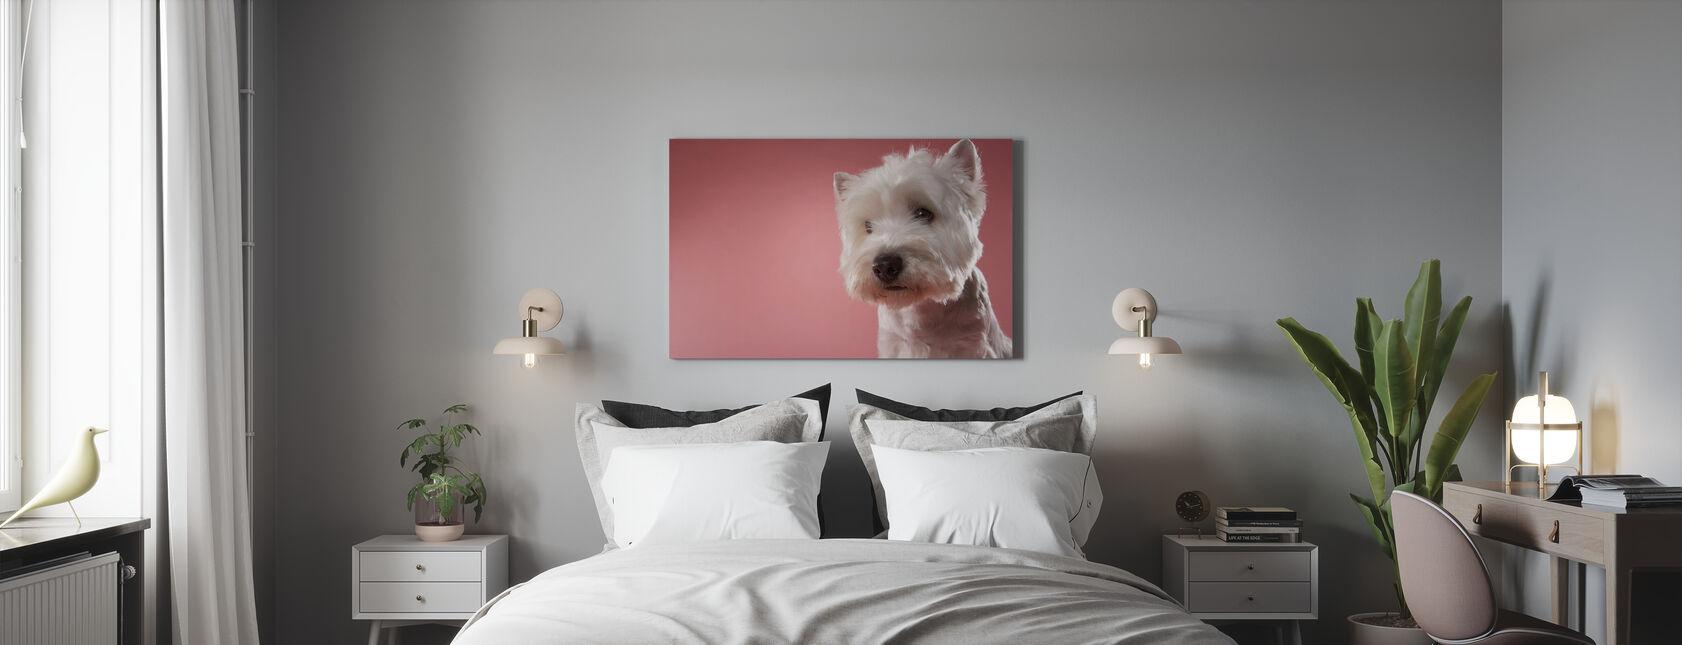 West Highland Terrier - Canvas print - Bedroom